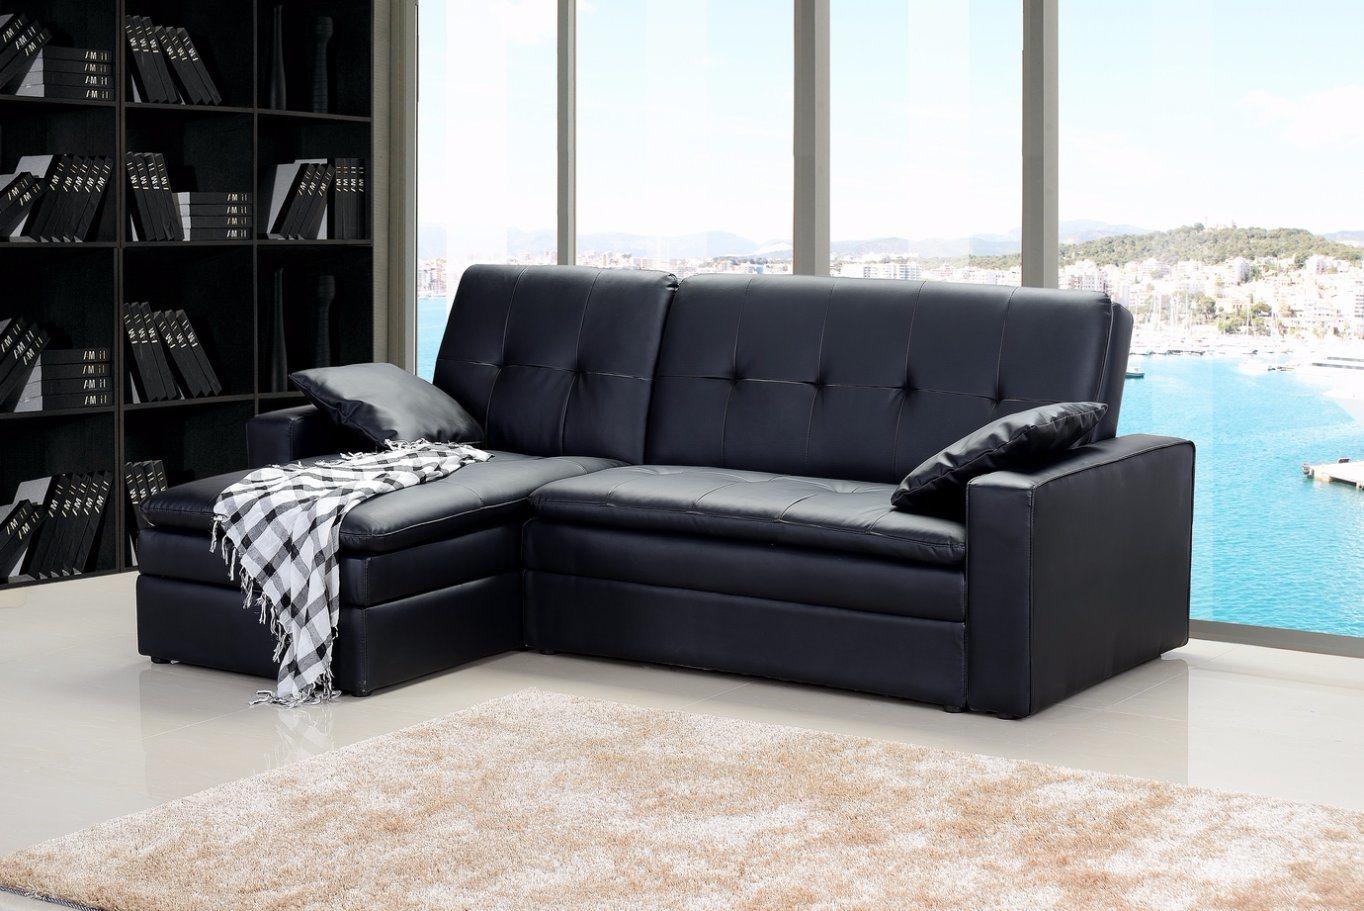 Awe Inspiring China Semi Pu Or Pvc Or Bonded Leather Corner Storage White Beatyapartments Chair Design Images Beatyapartmentscom